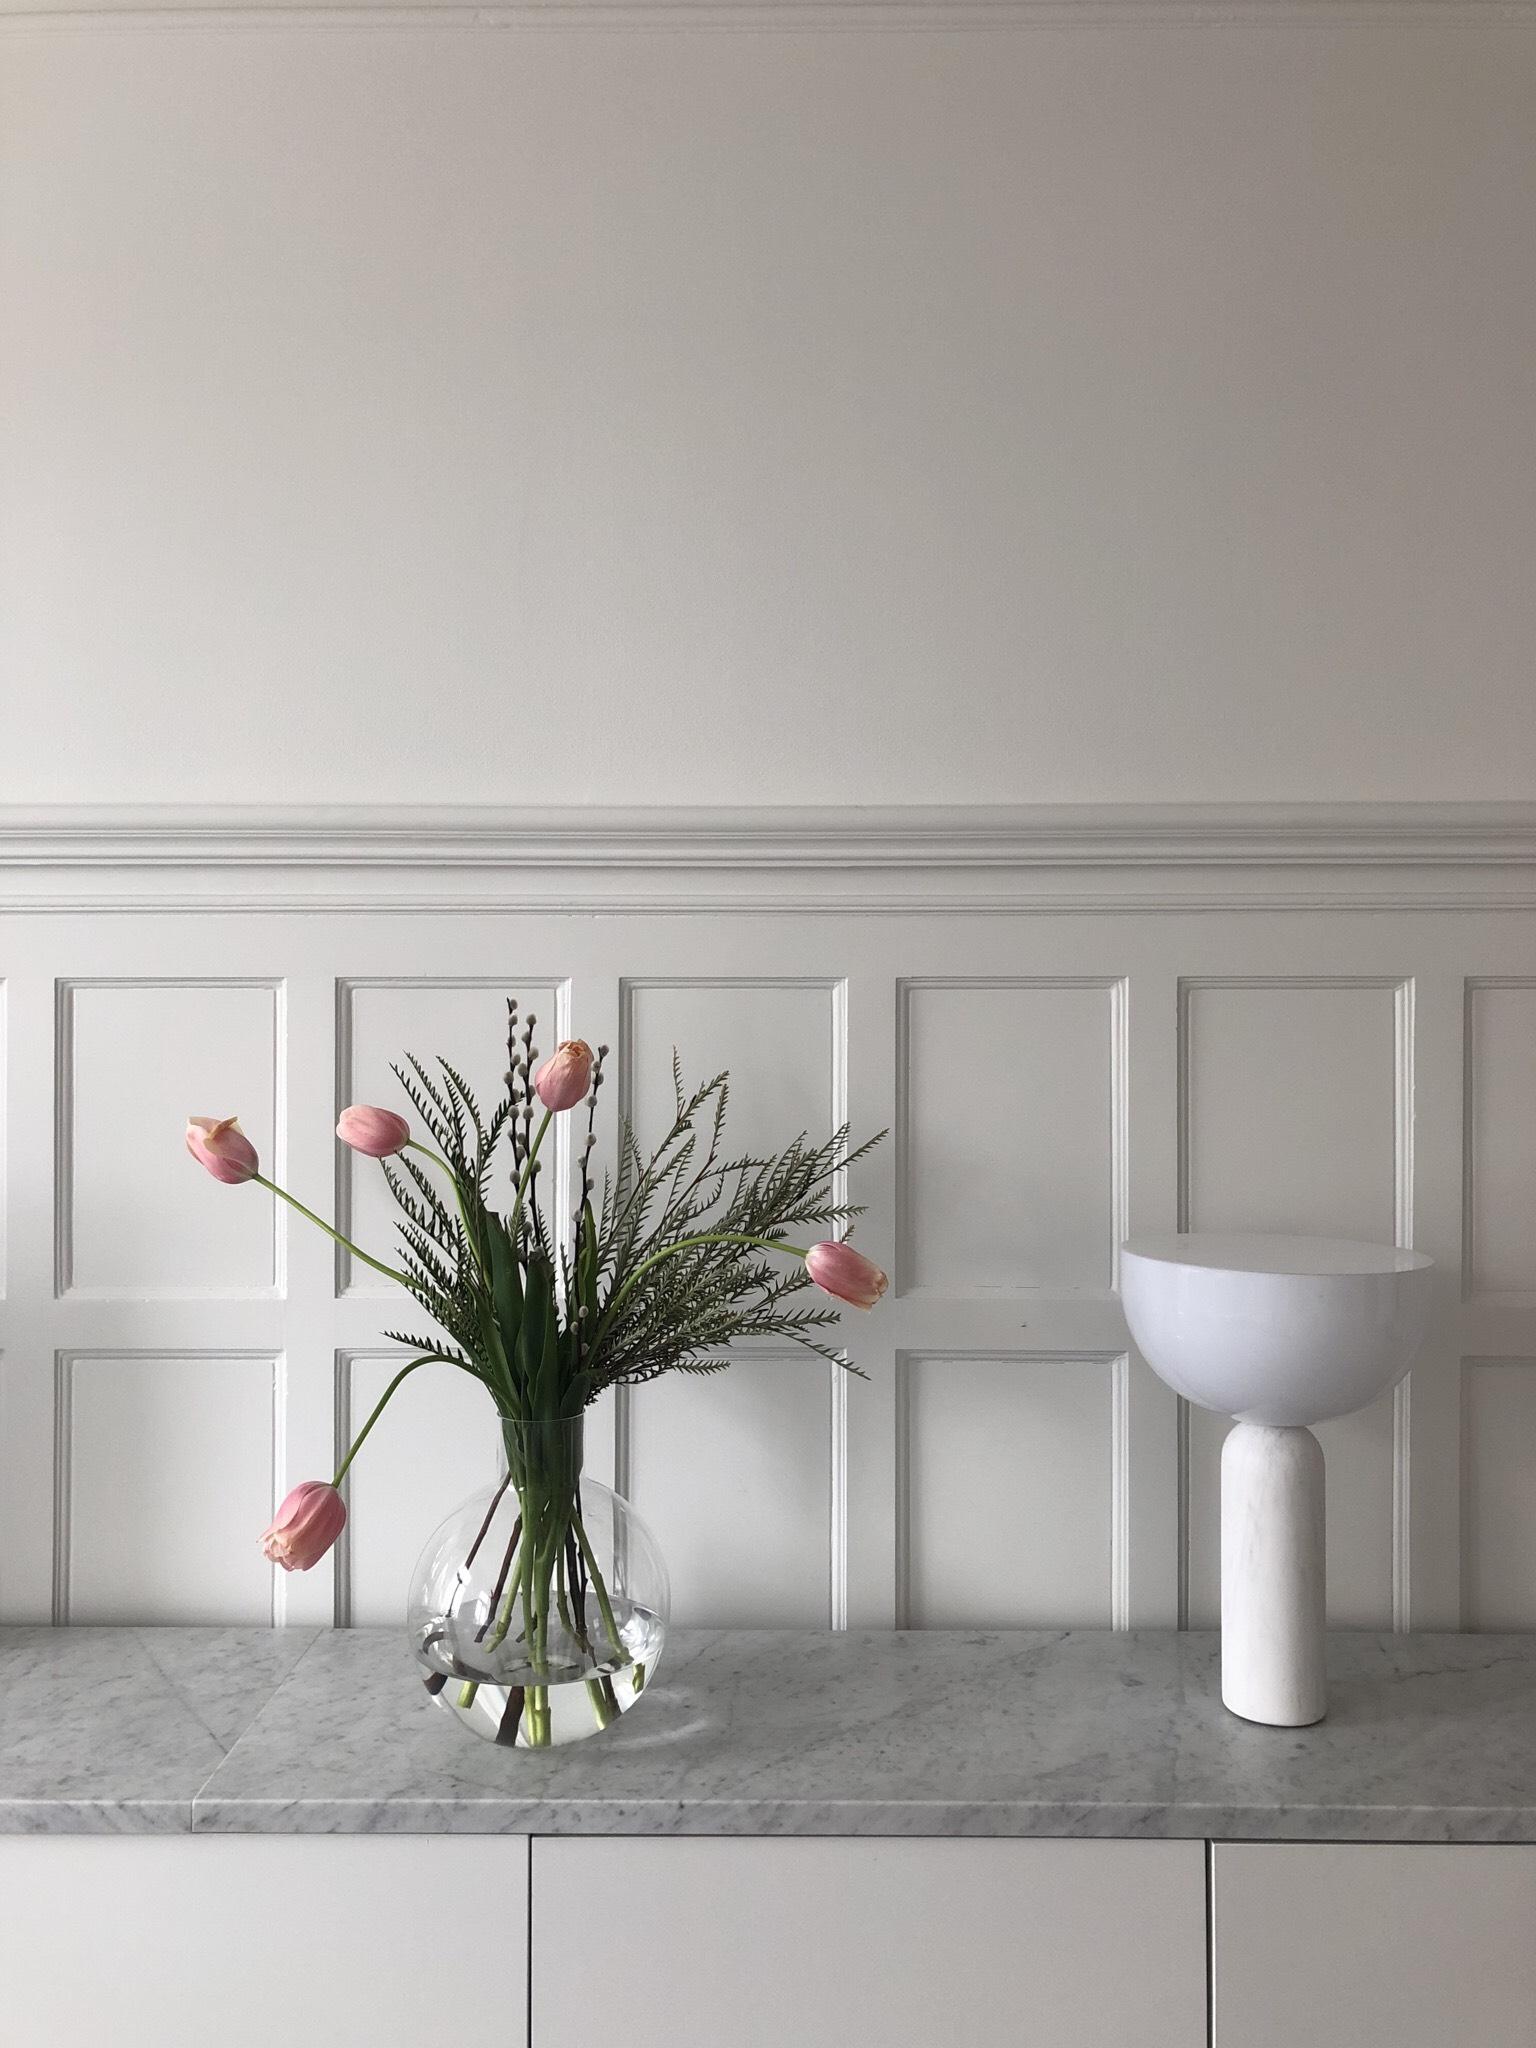 Prenumerera på blommor Stockholm Pris 295 kr